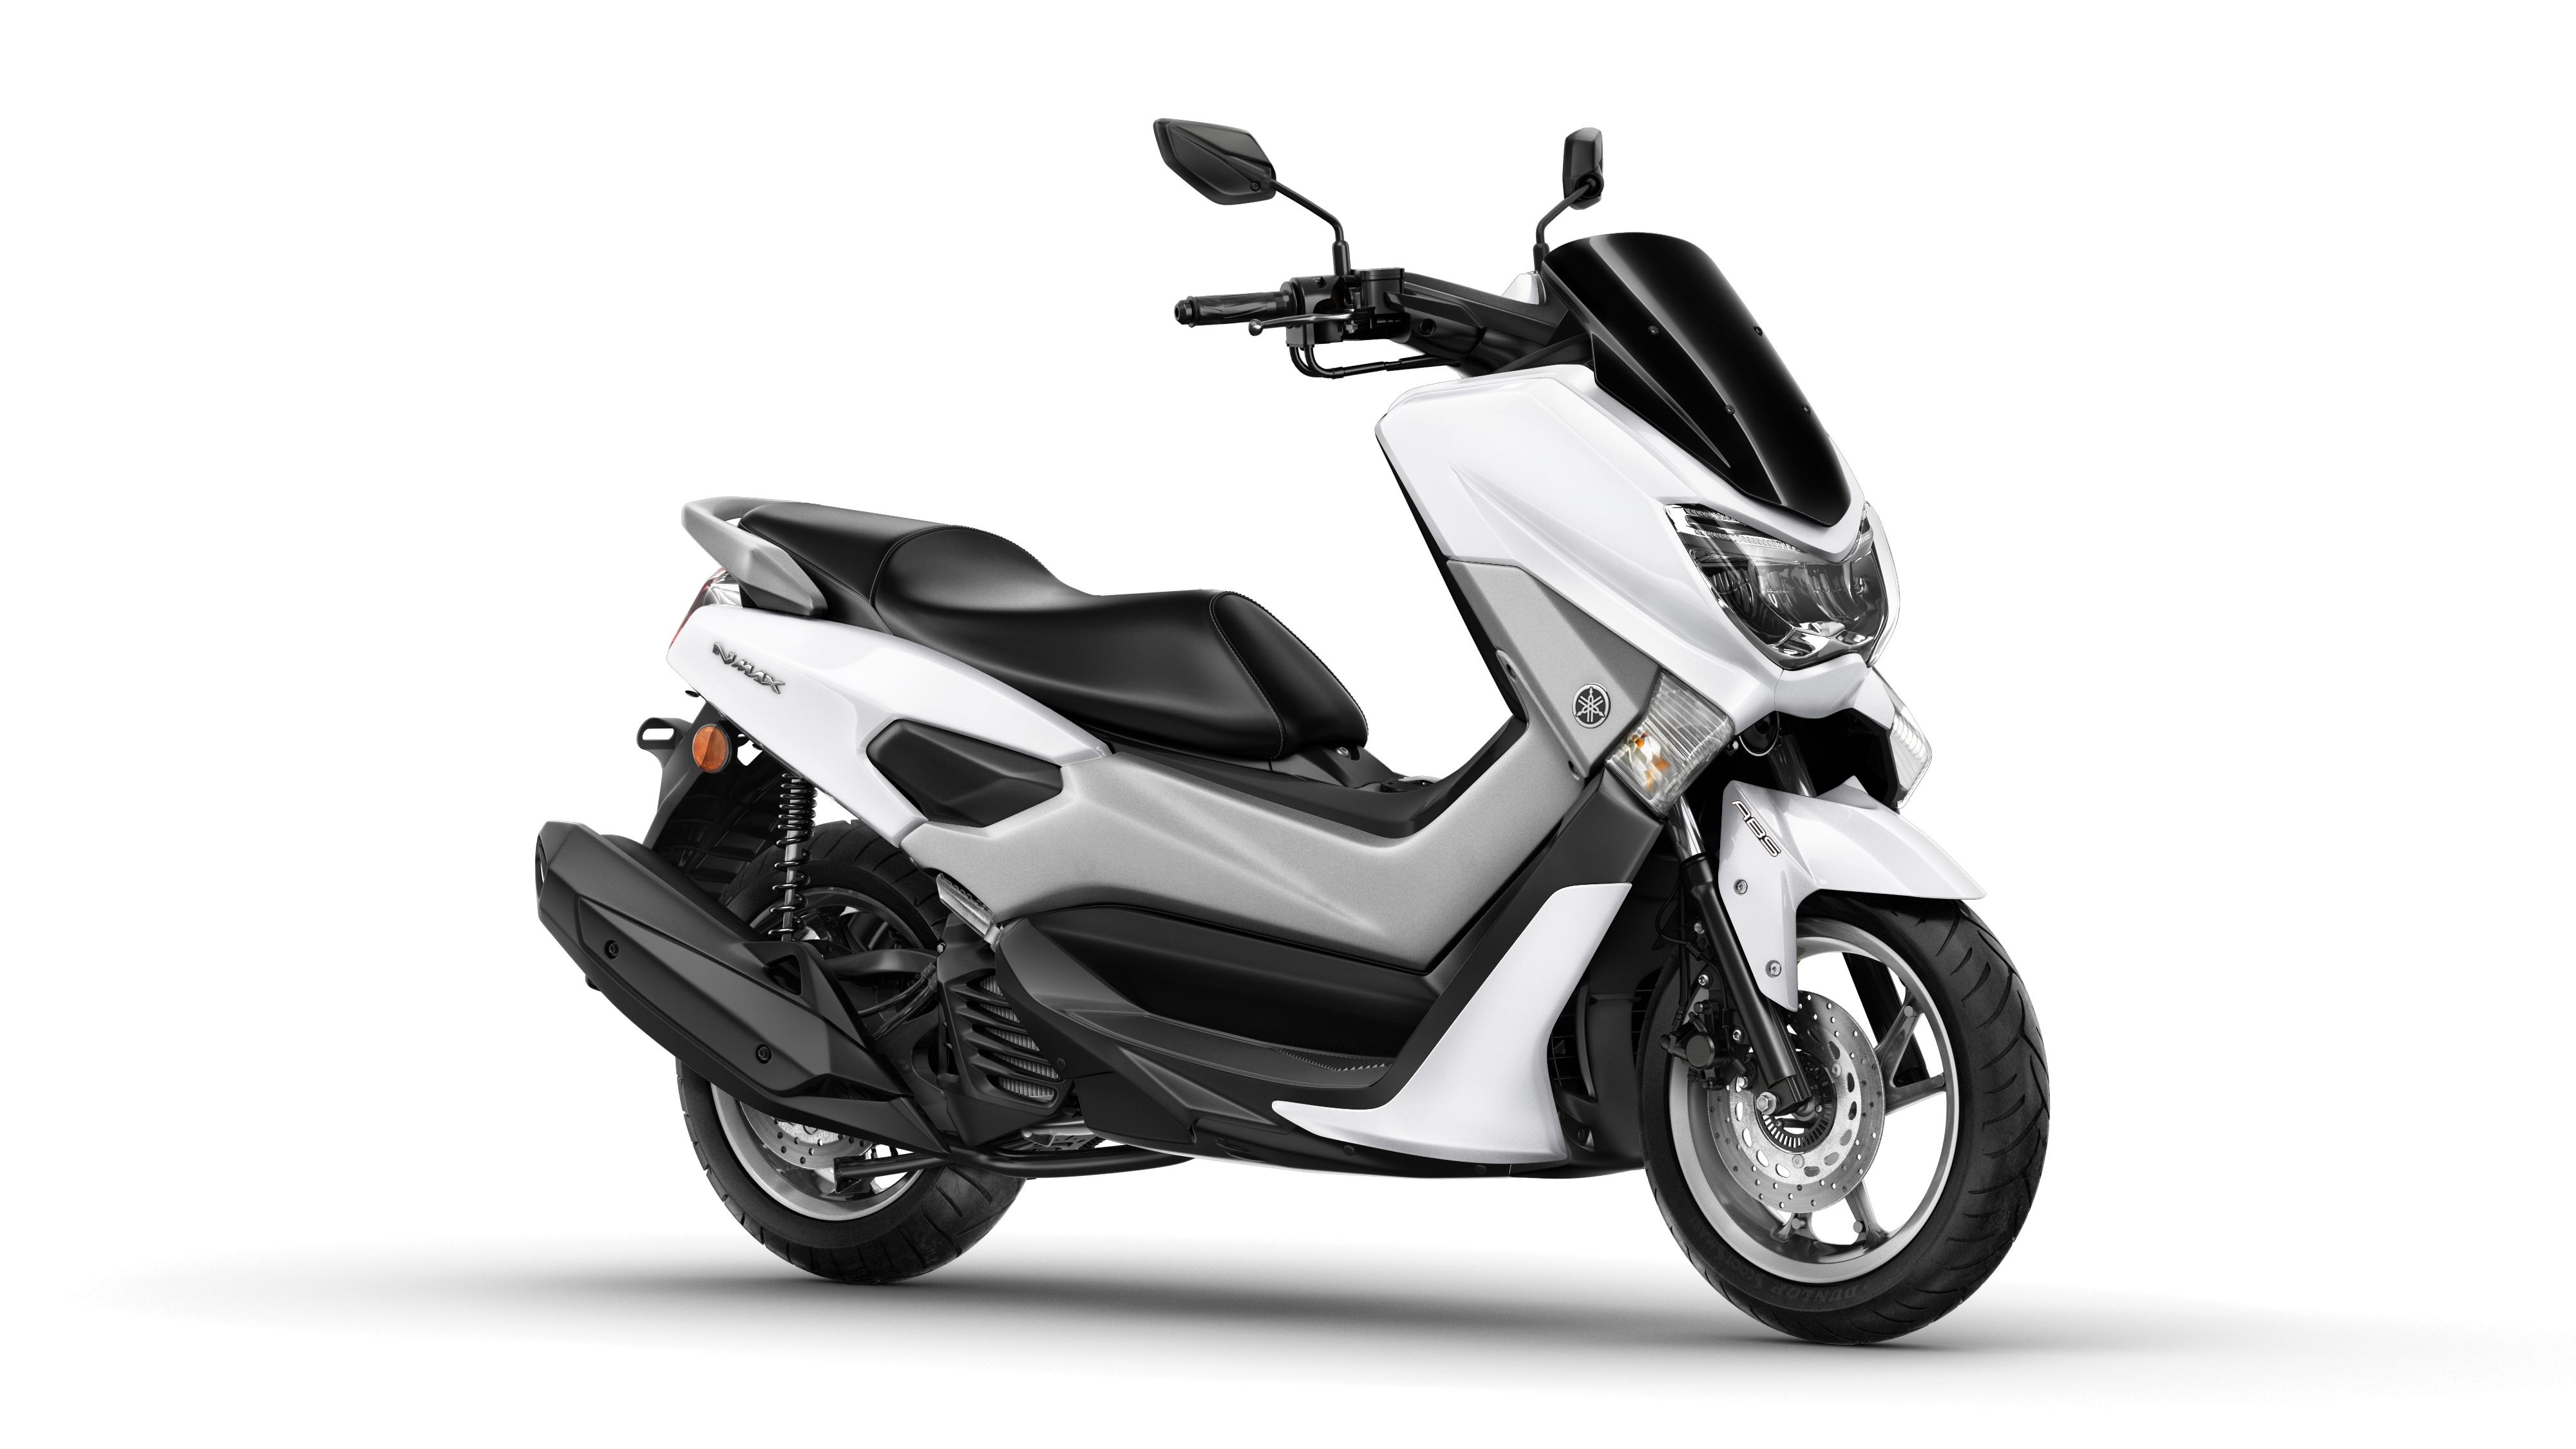 Yamaha NMAX 125 - MotorCentrumWest